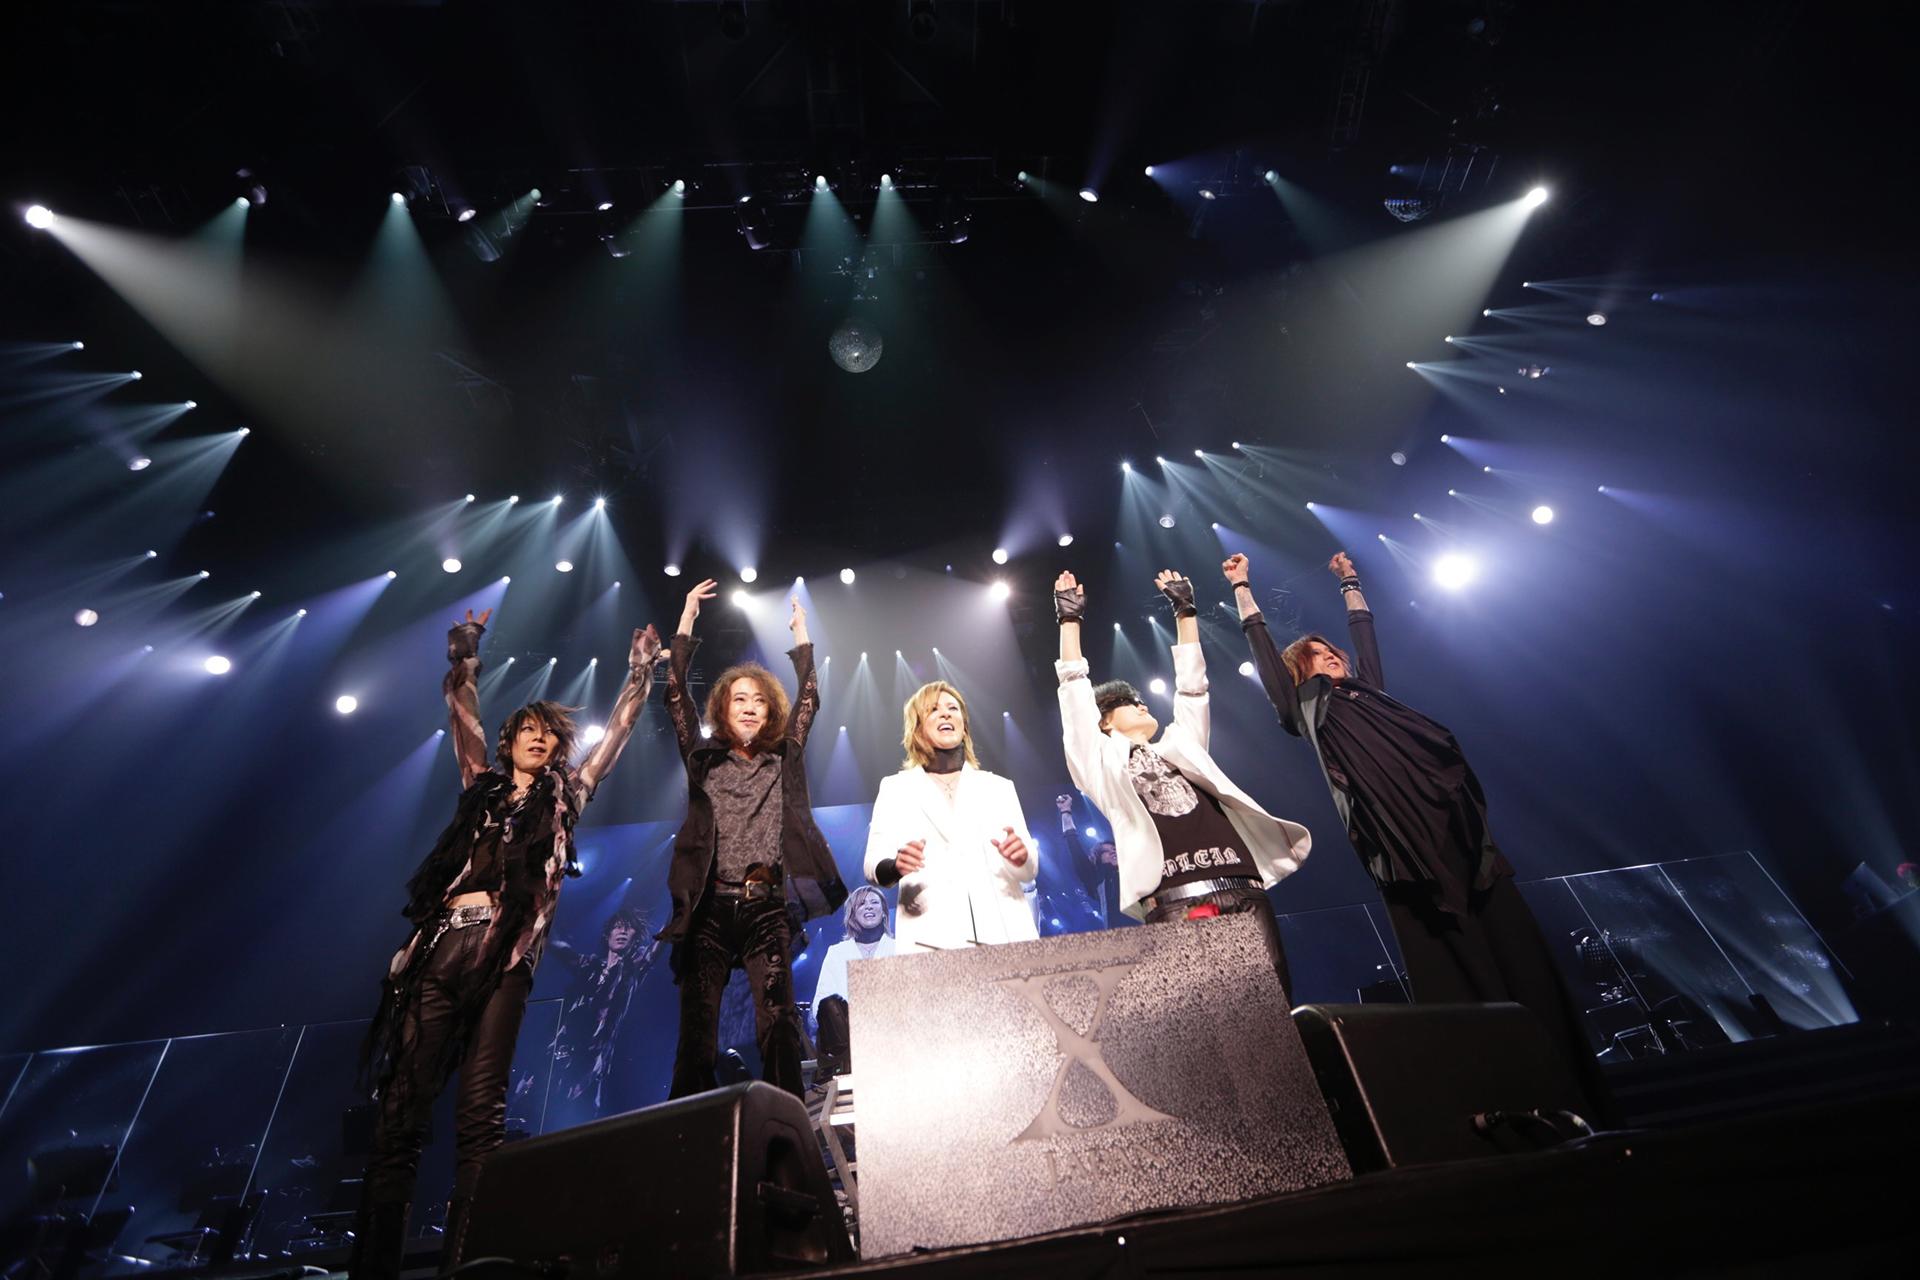 JRock247-X-Japan-World-Tour-2017-Yokohama-2017-07-14-21860